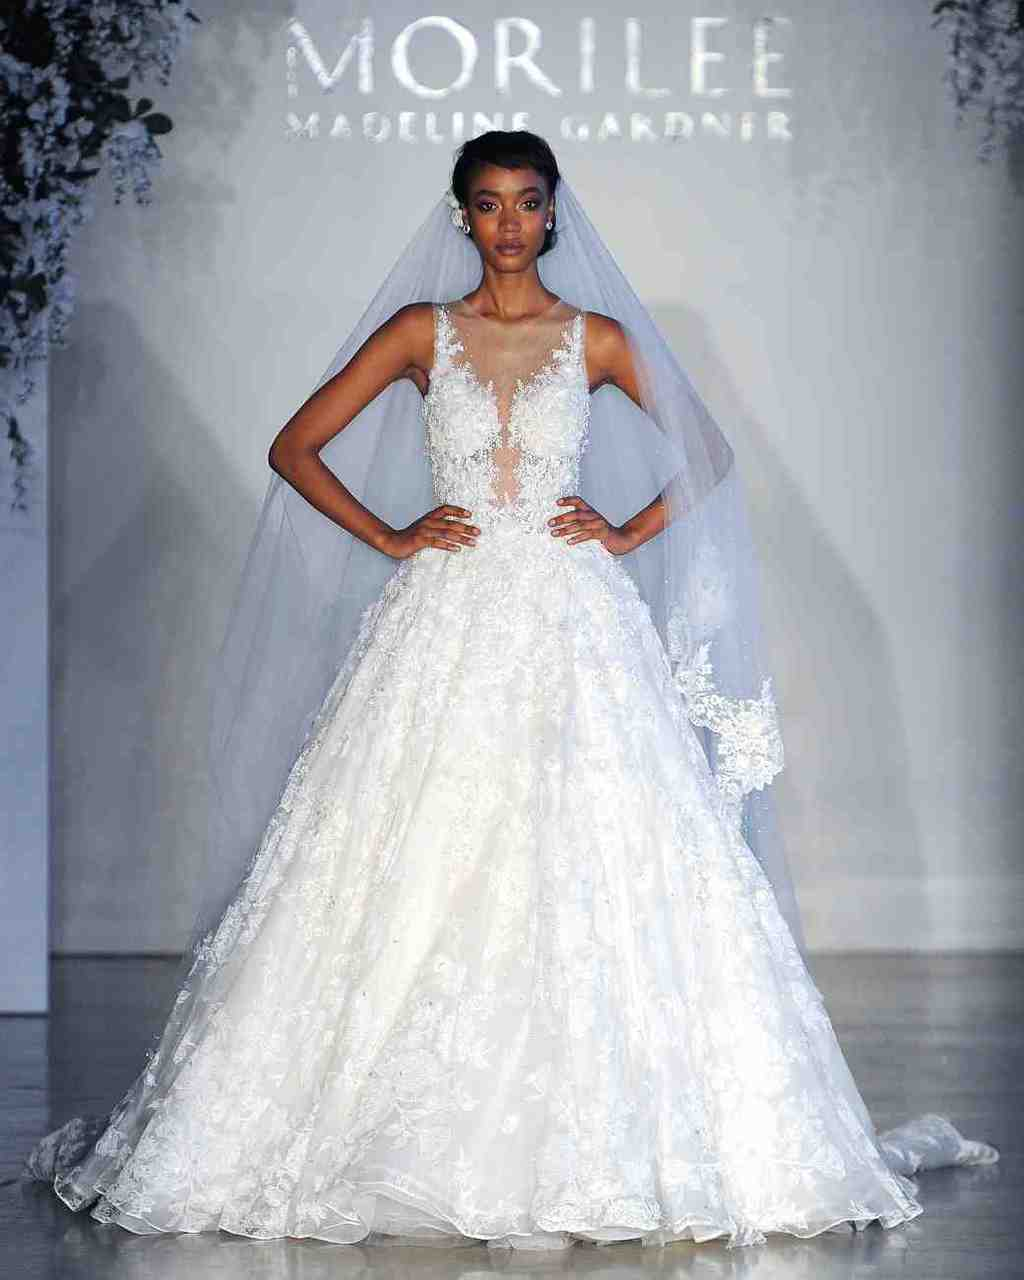 morilee-wedding-dress-bridal2017-6203351-026_vert